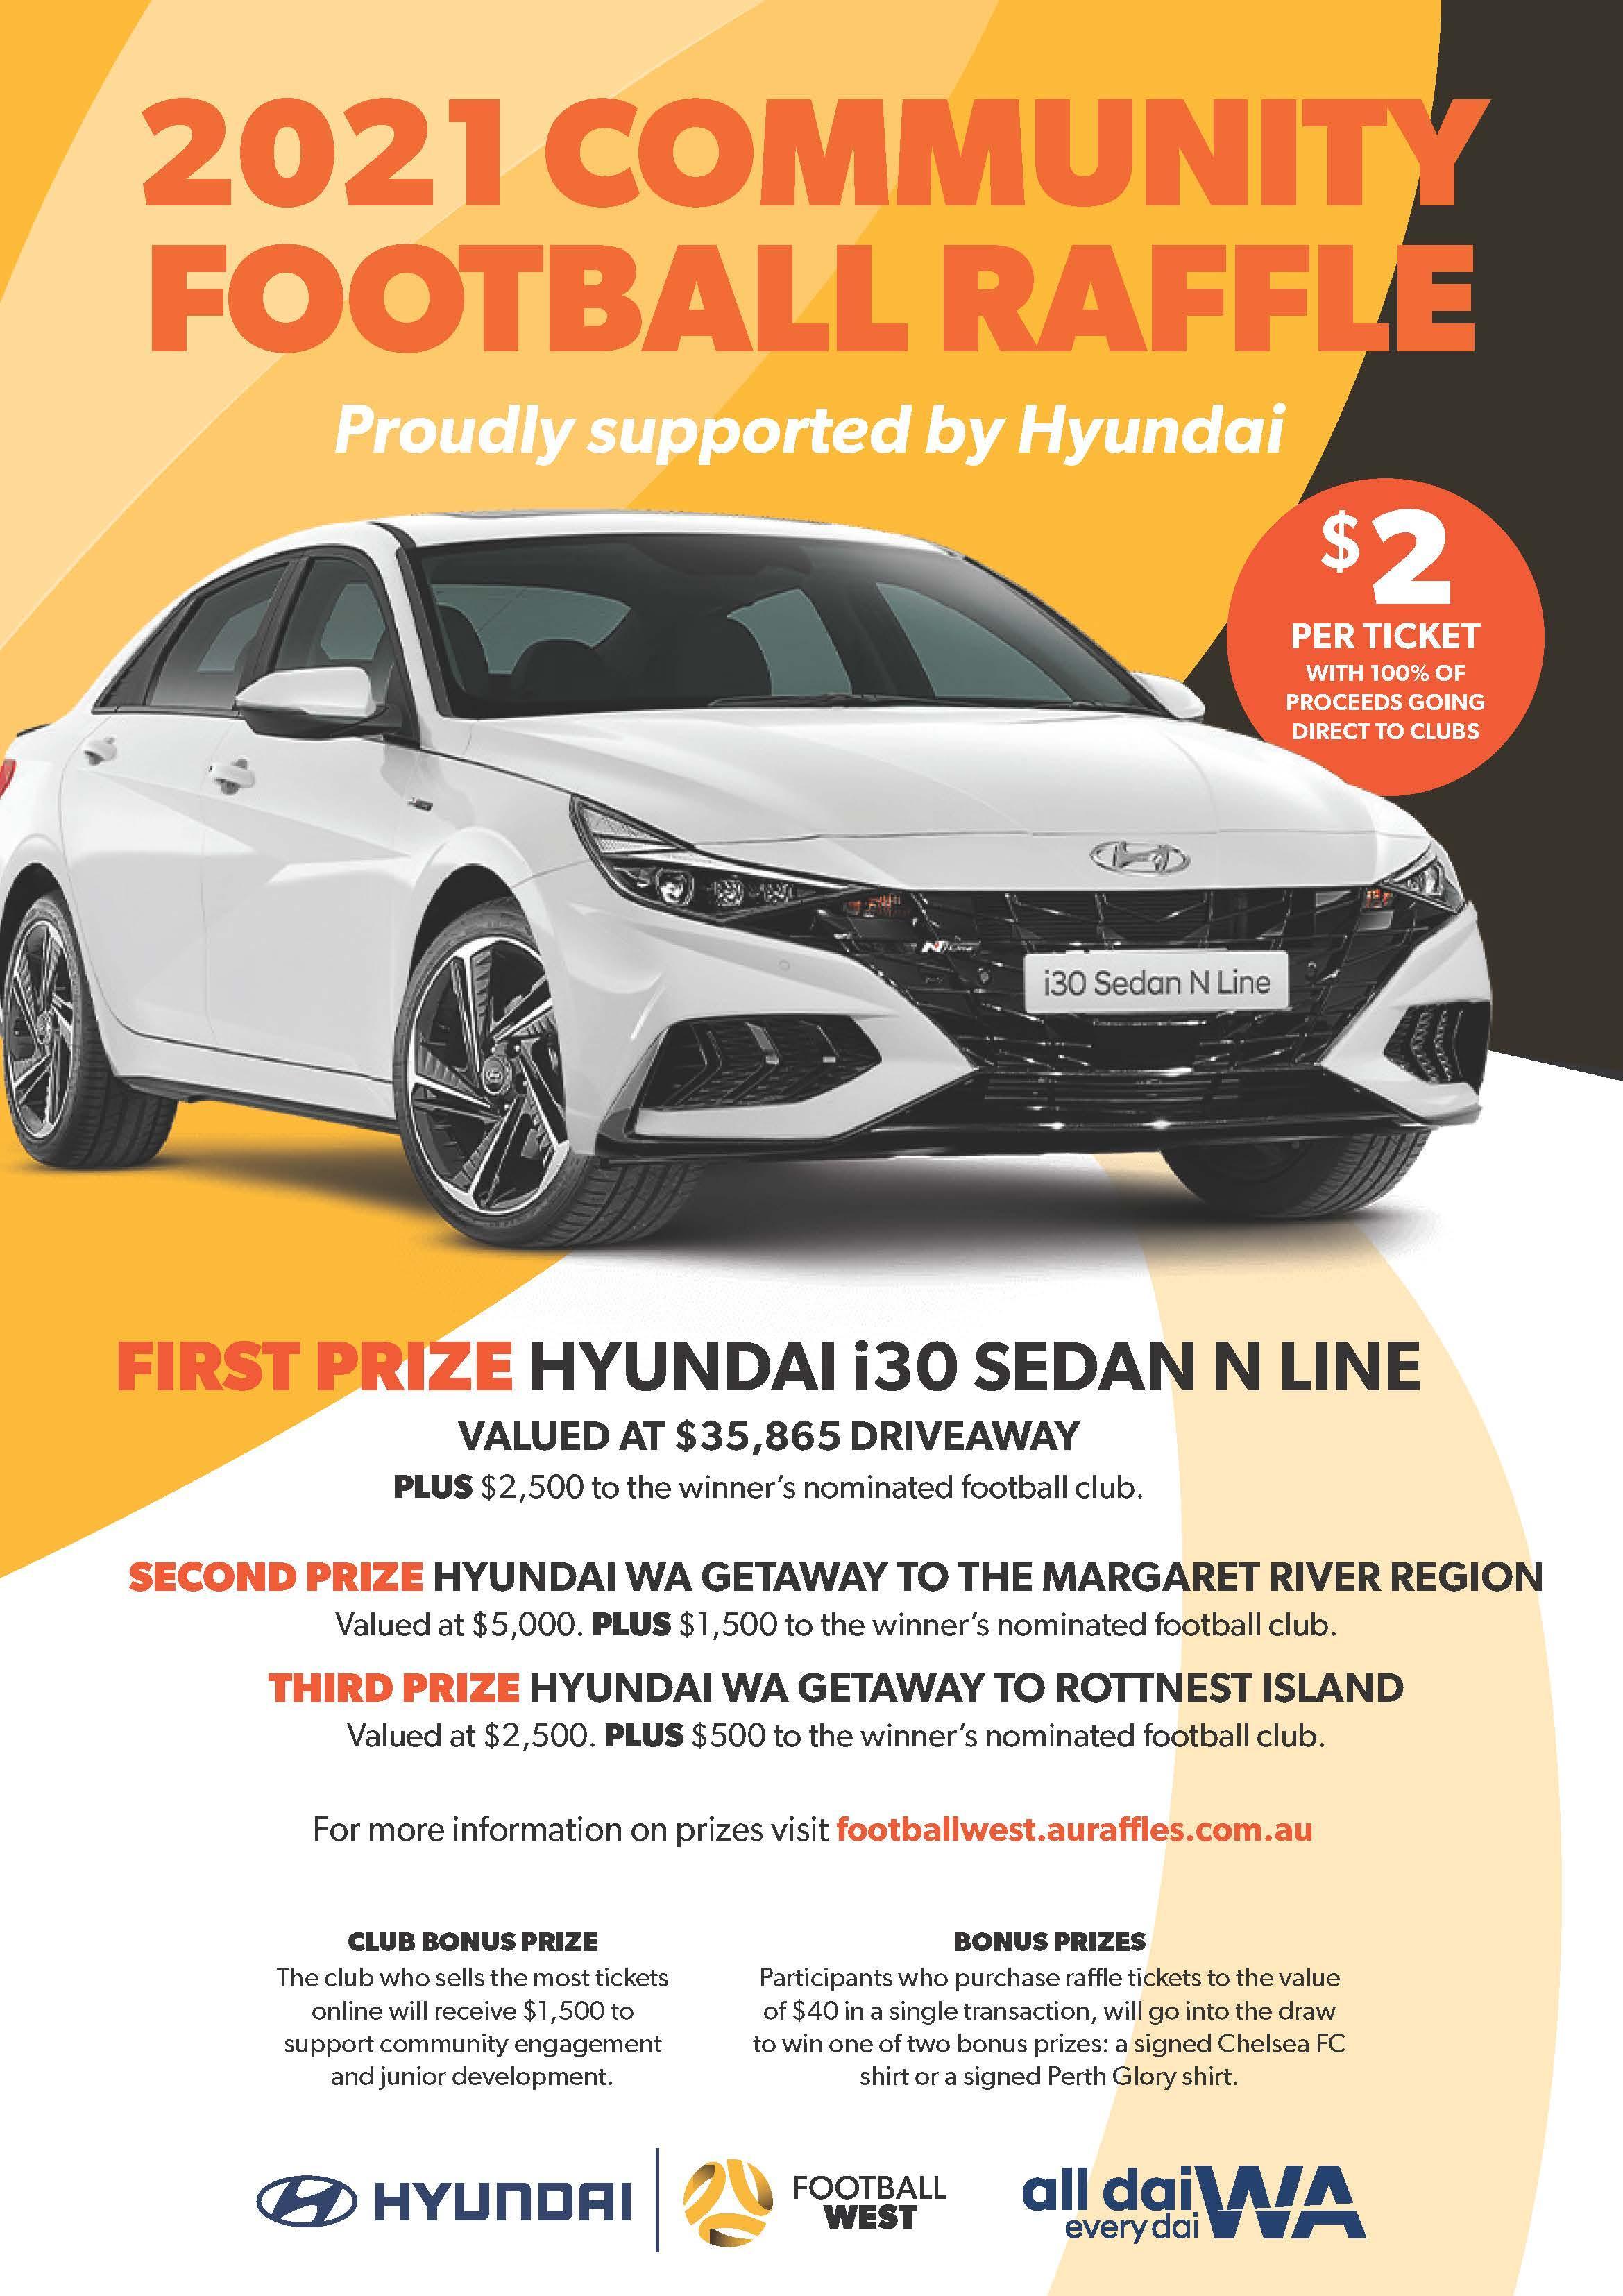 Hyundai raffle now live